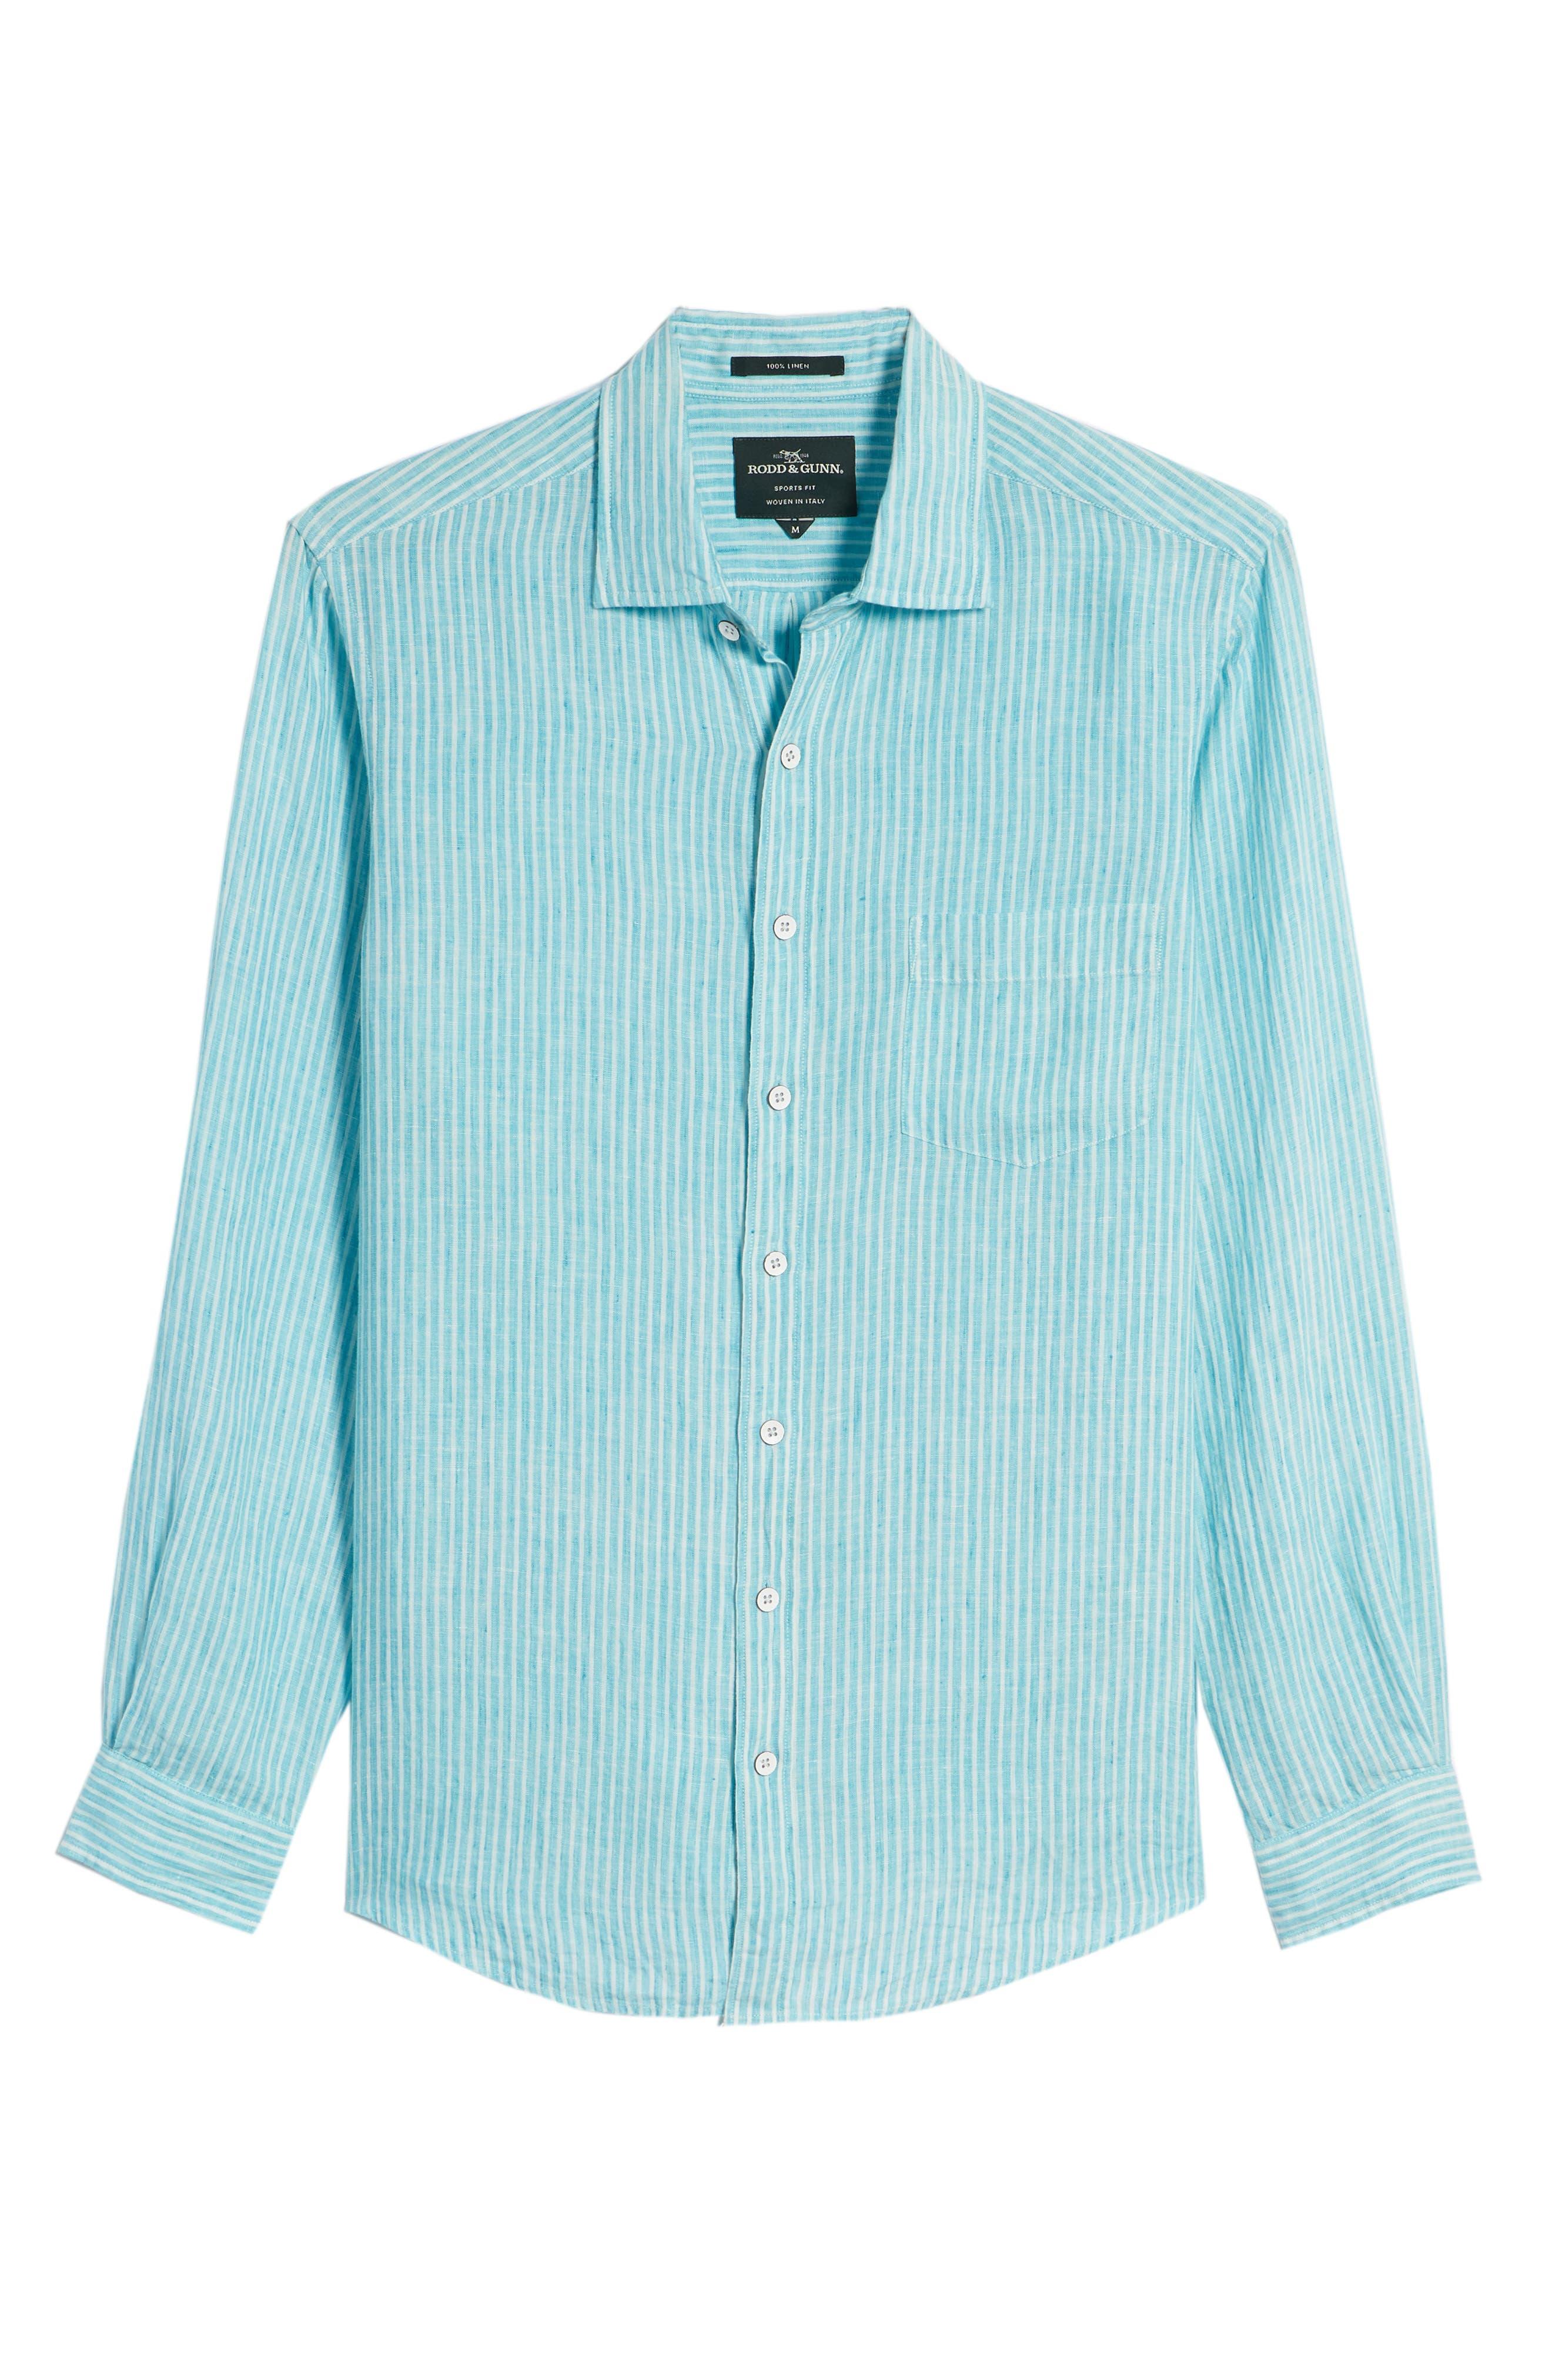 Warwick Junction Stripe Linen Sport Shirt,                             Alternate thumbnail 6, color,                             TEAL